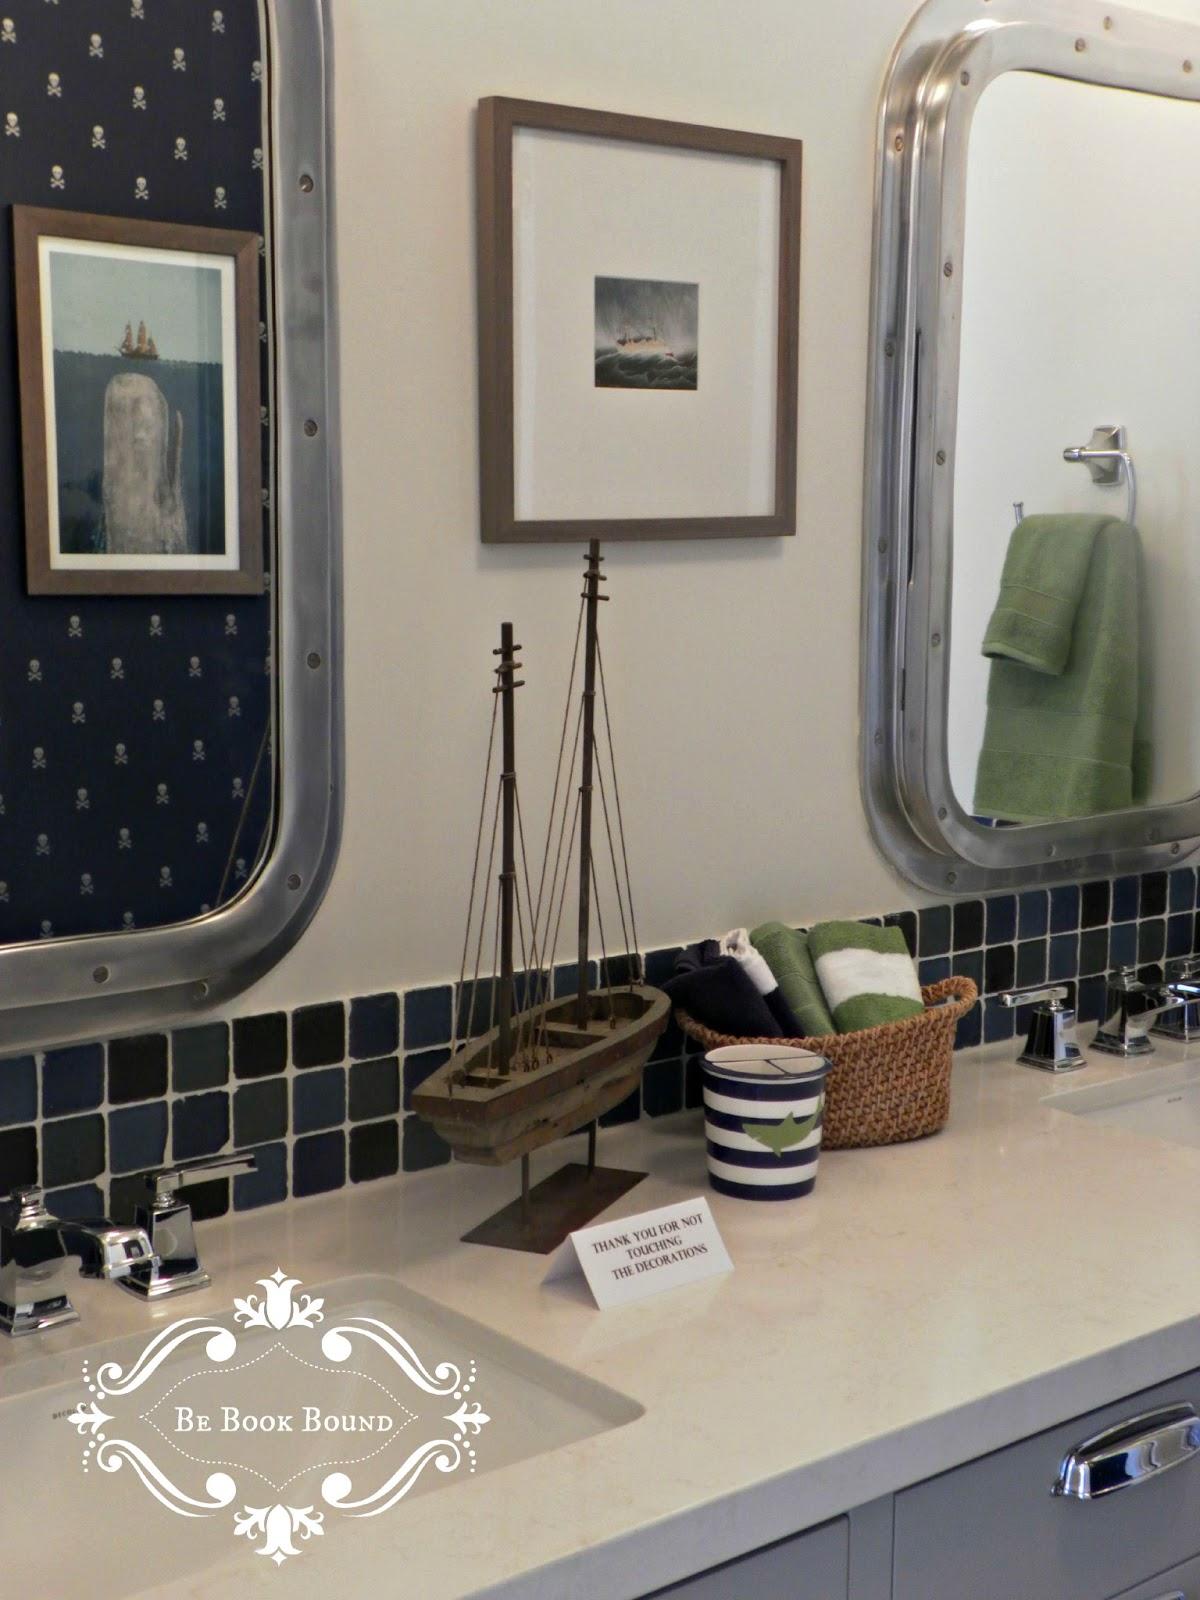 Pirate bathroom decor for kids - Pirate Bathroom Decor For Kids